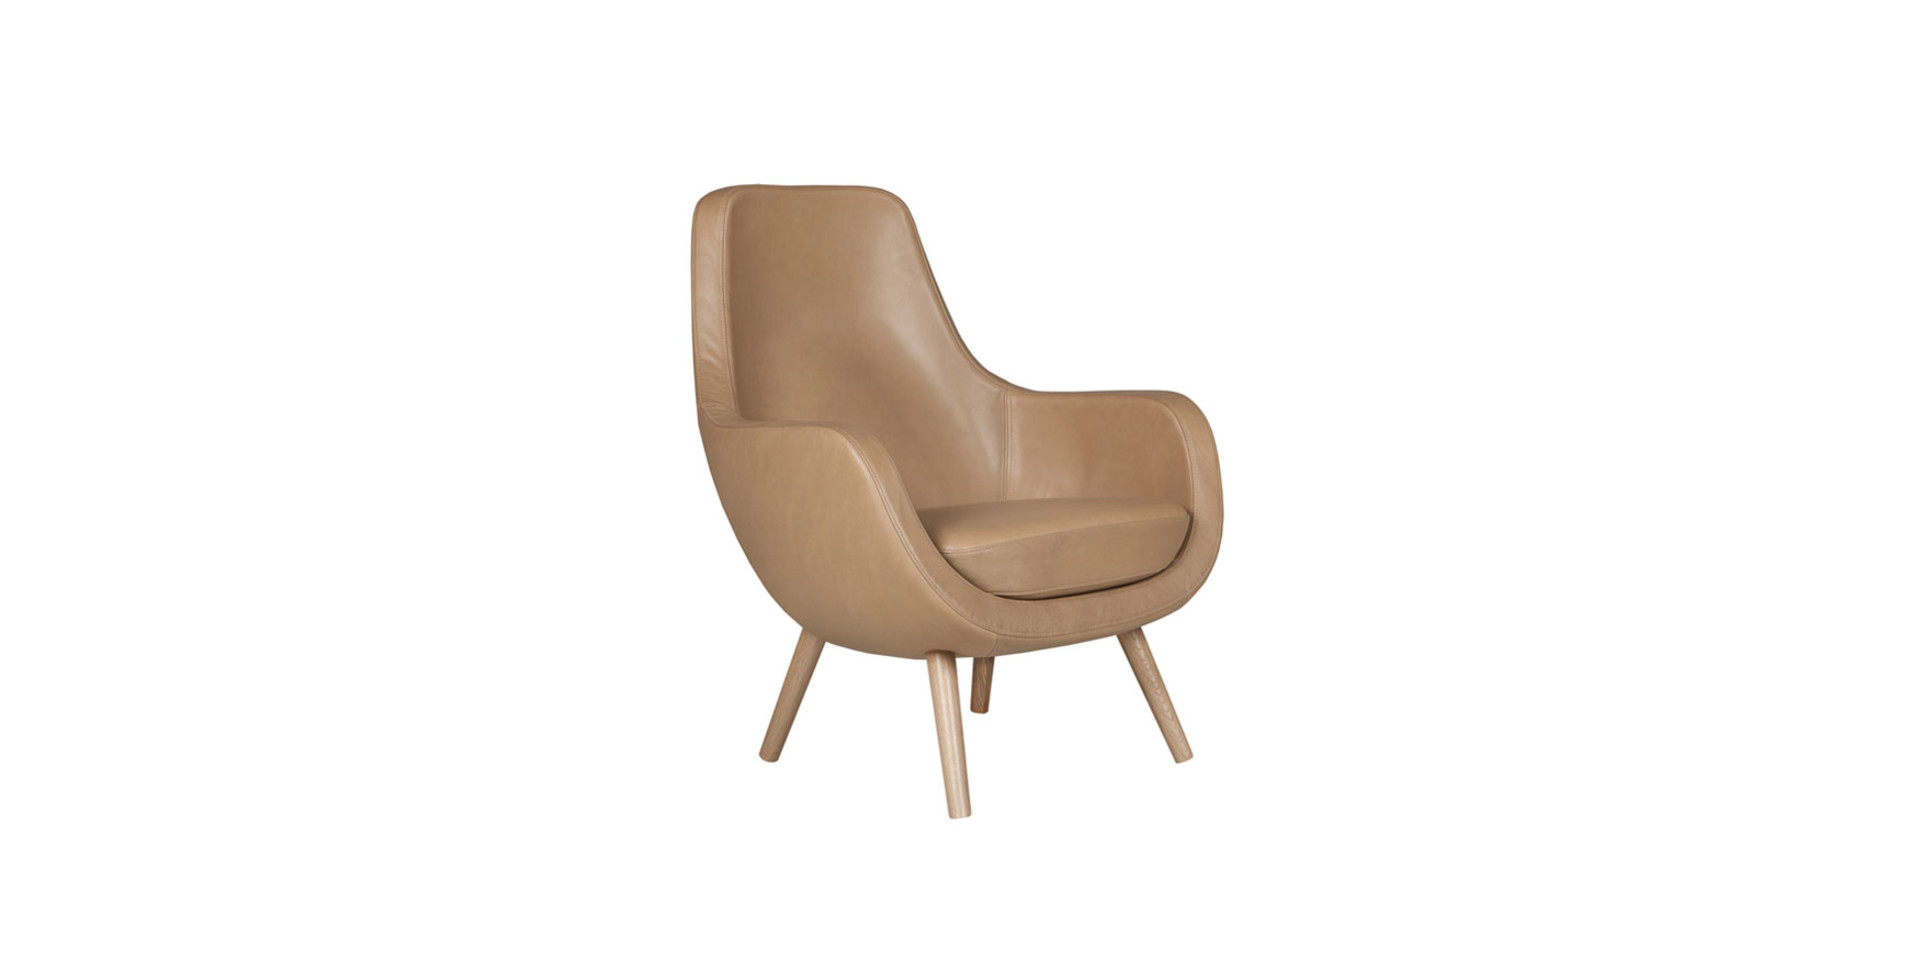 sits-stefani-fauteuil-aniline_sabbia_2